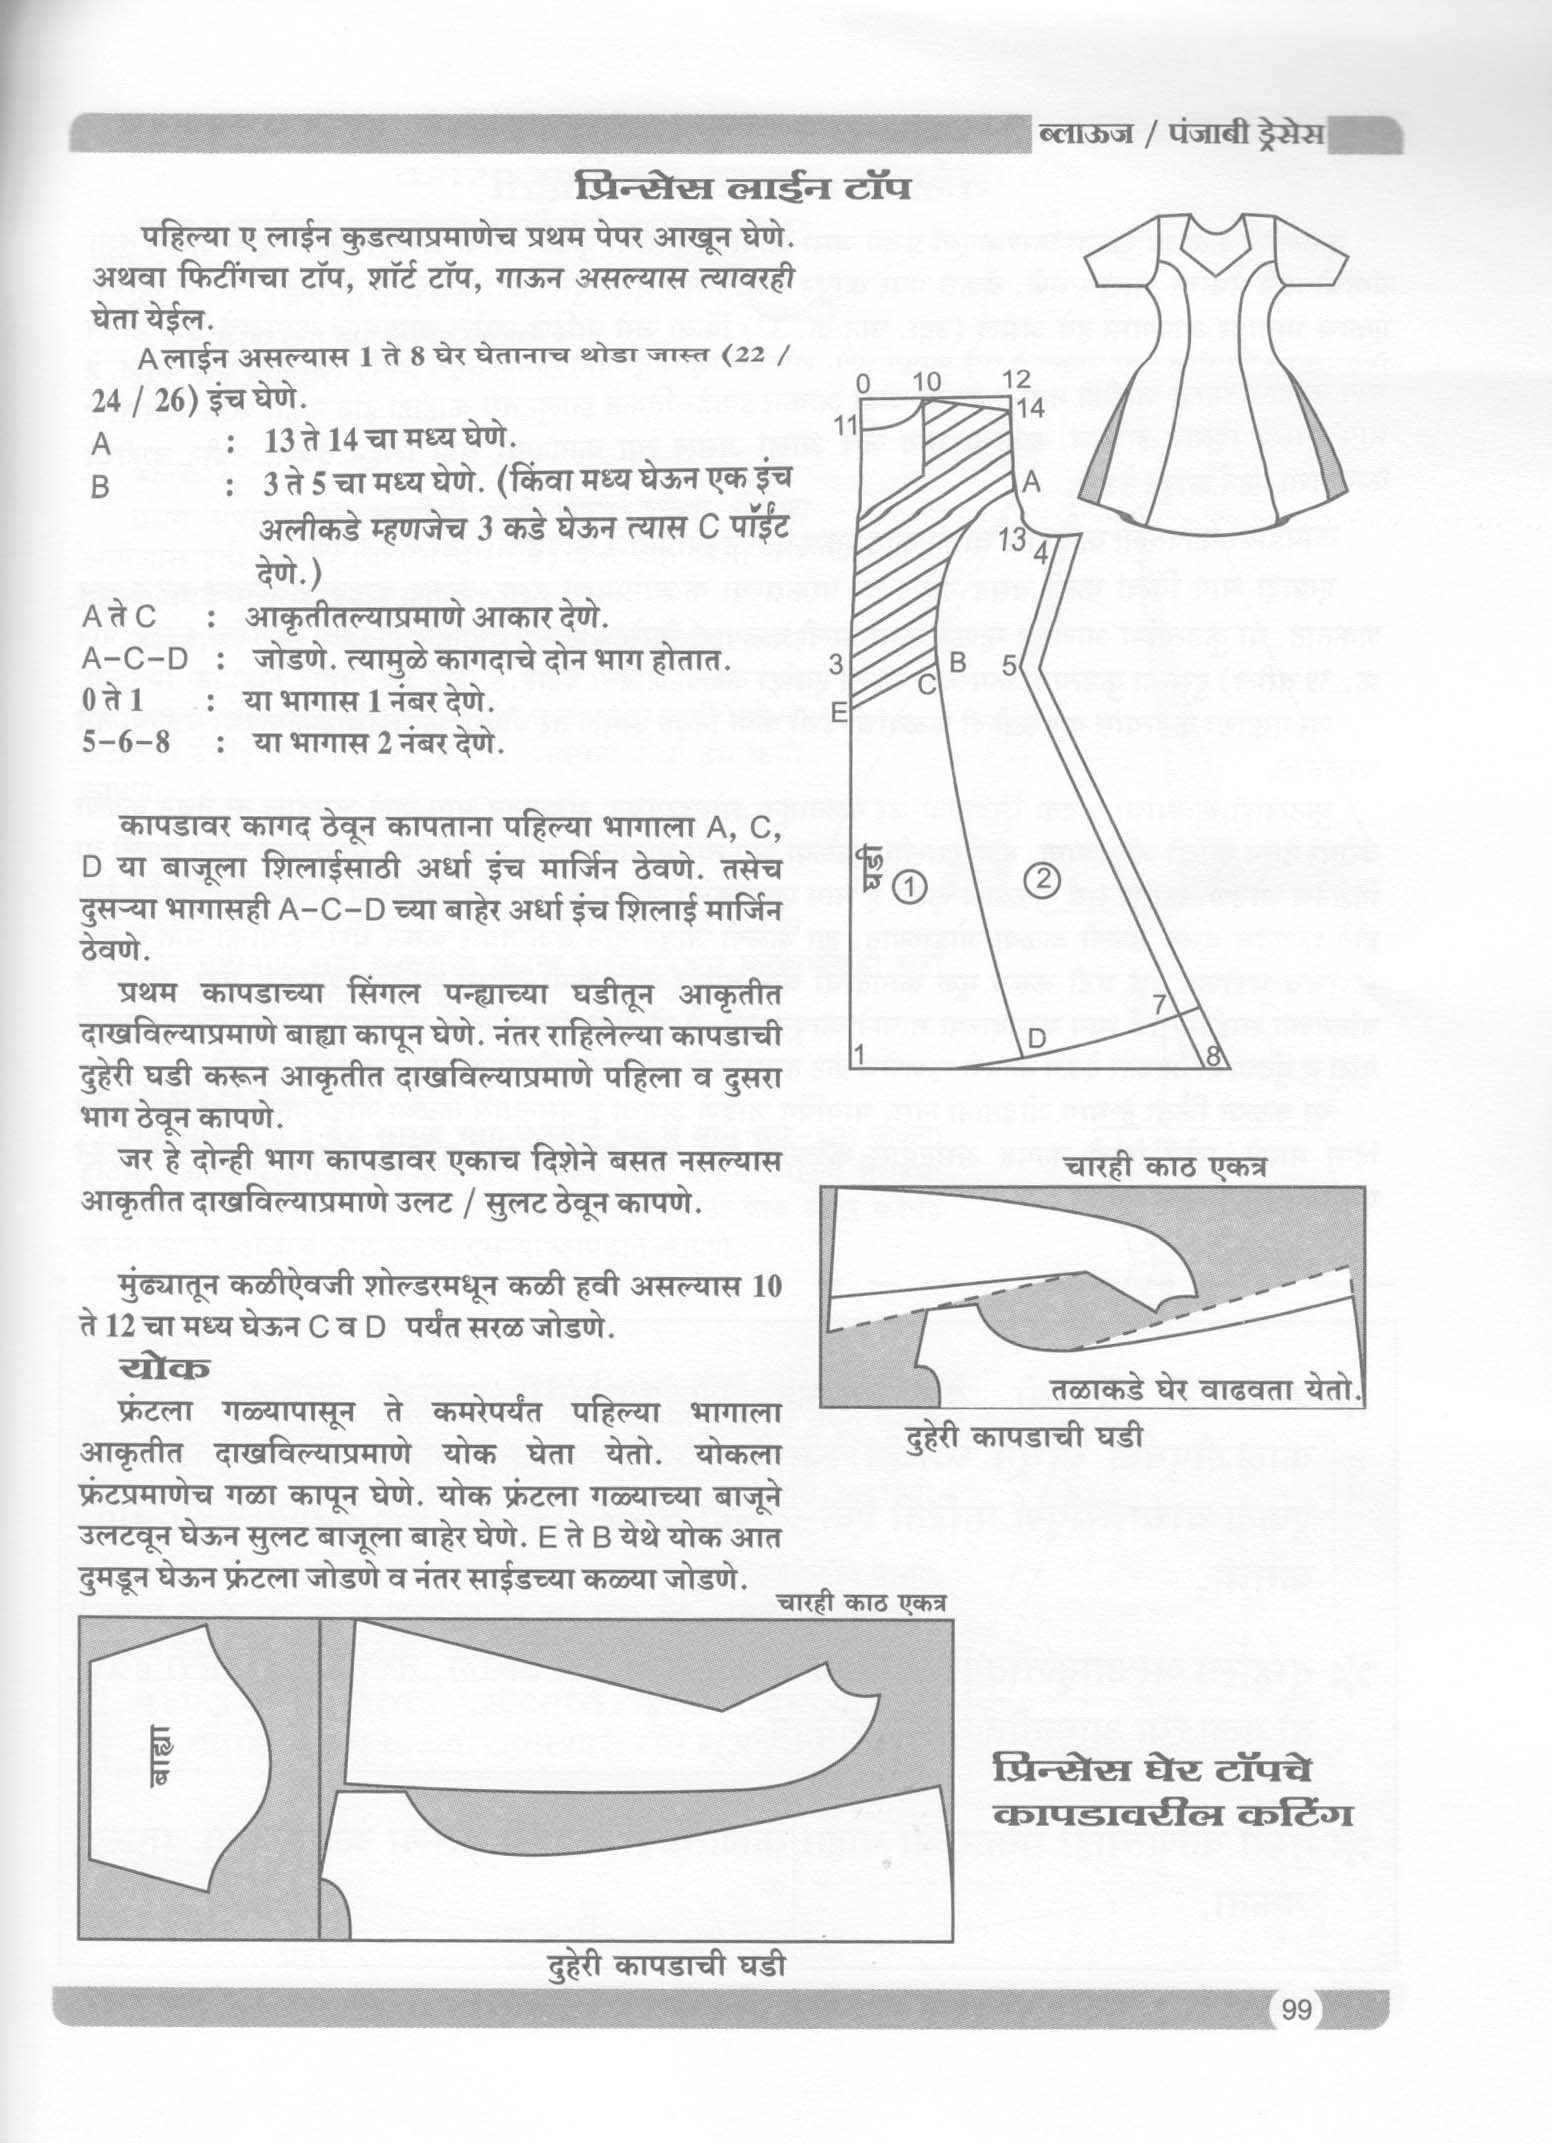 Buy Liberty Blouse Punjabi Dresses Theory Book In Marathi Book